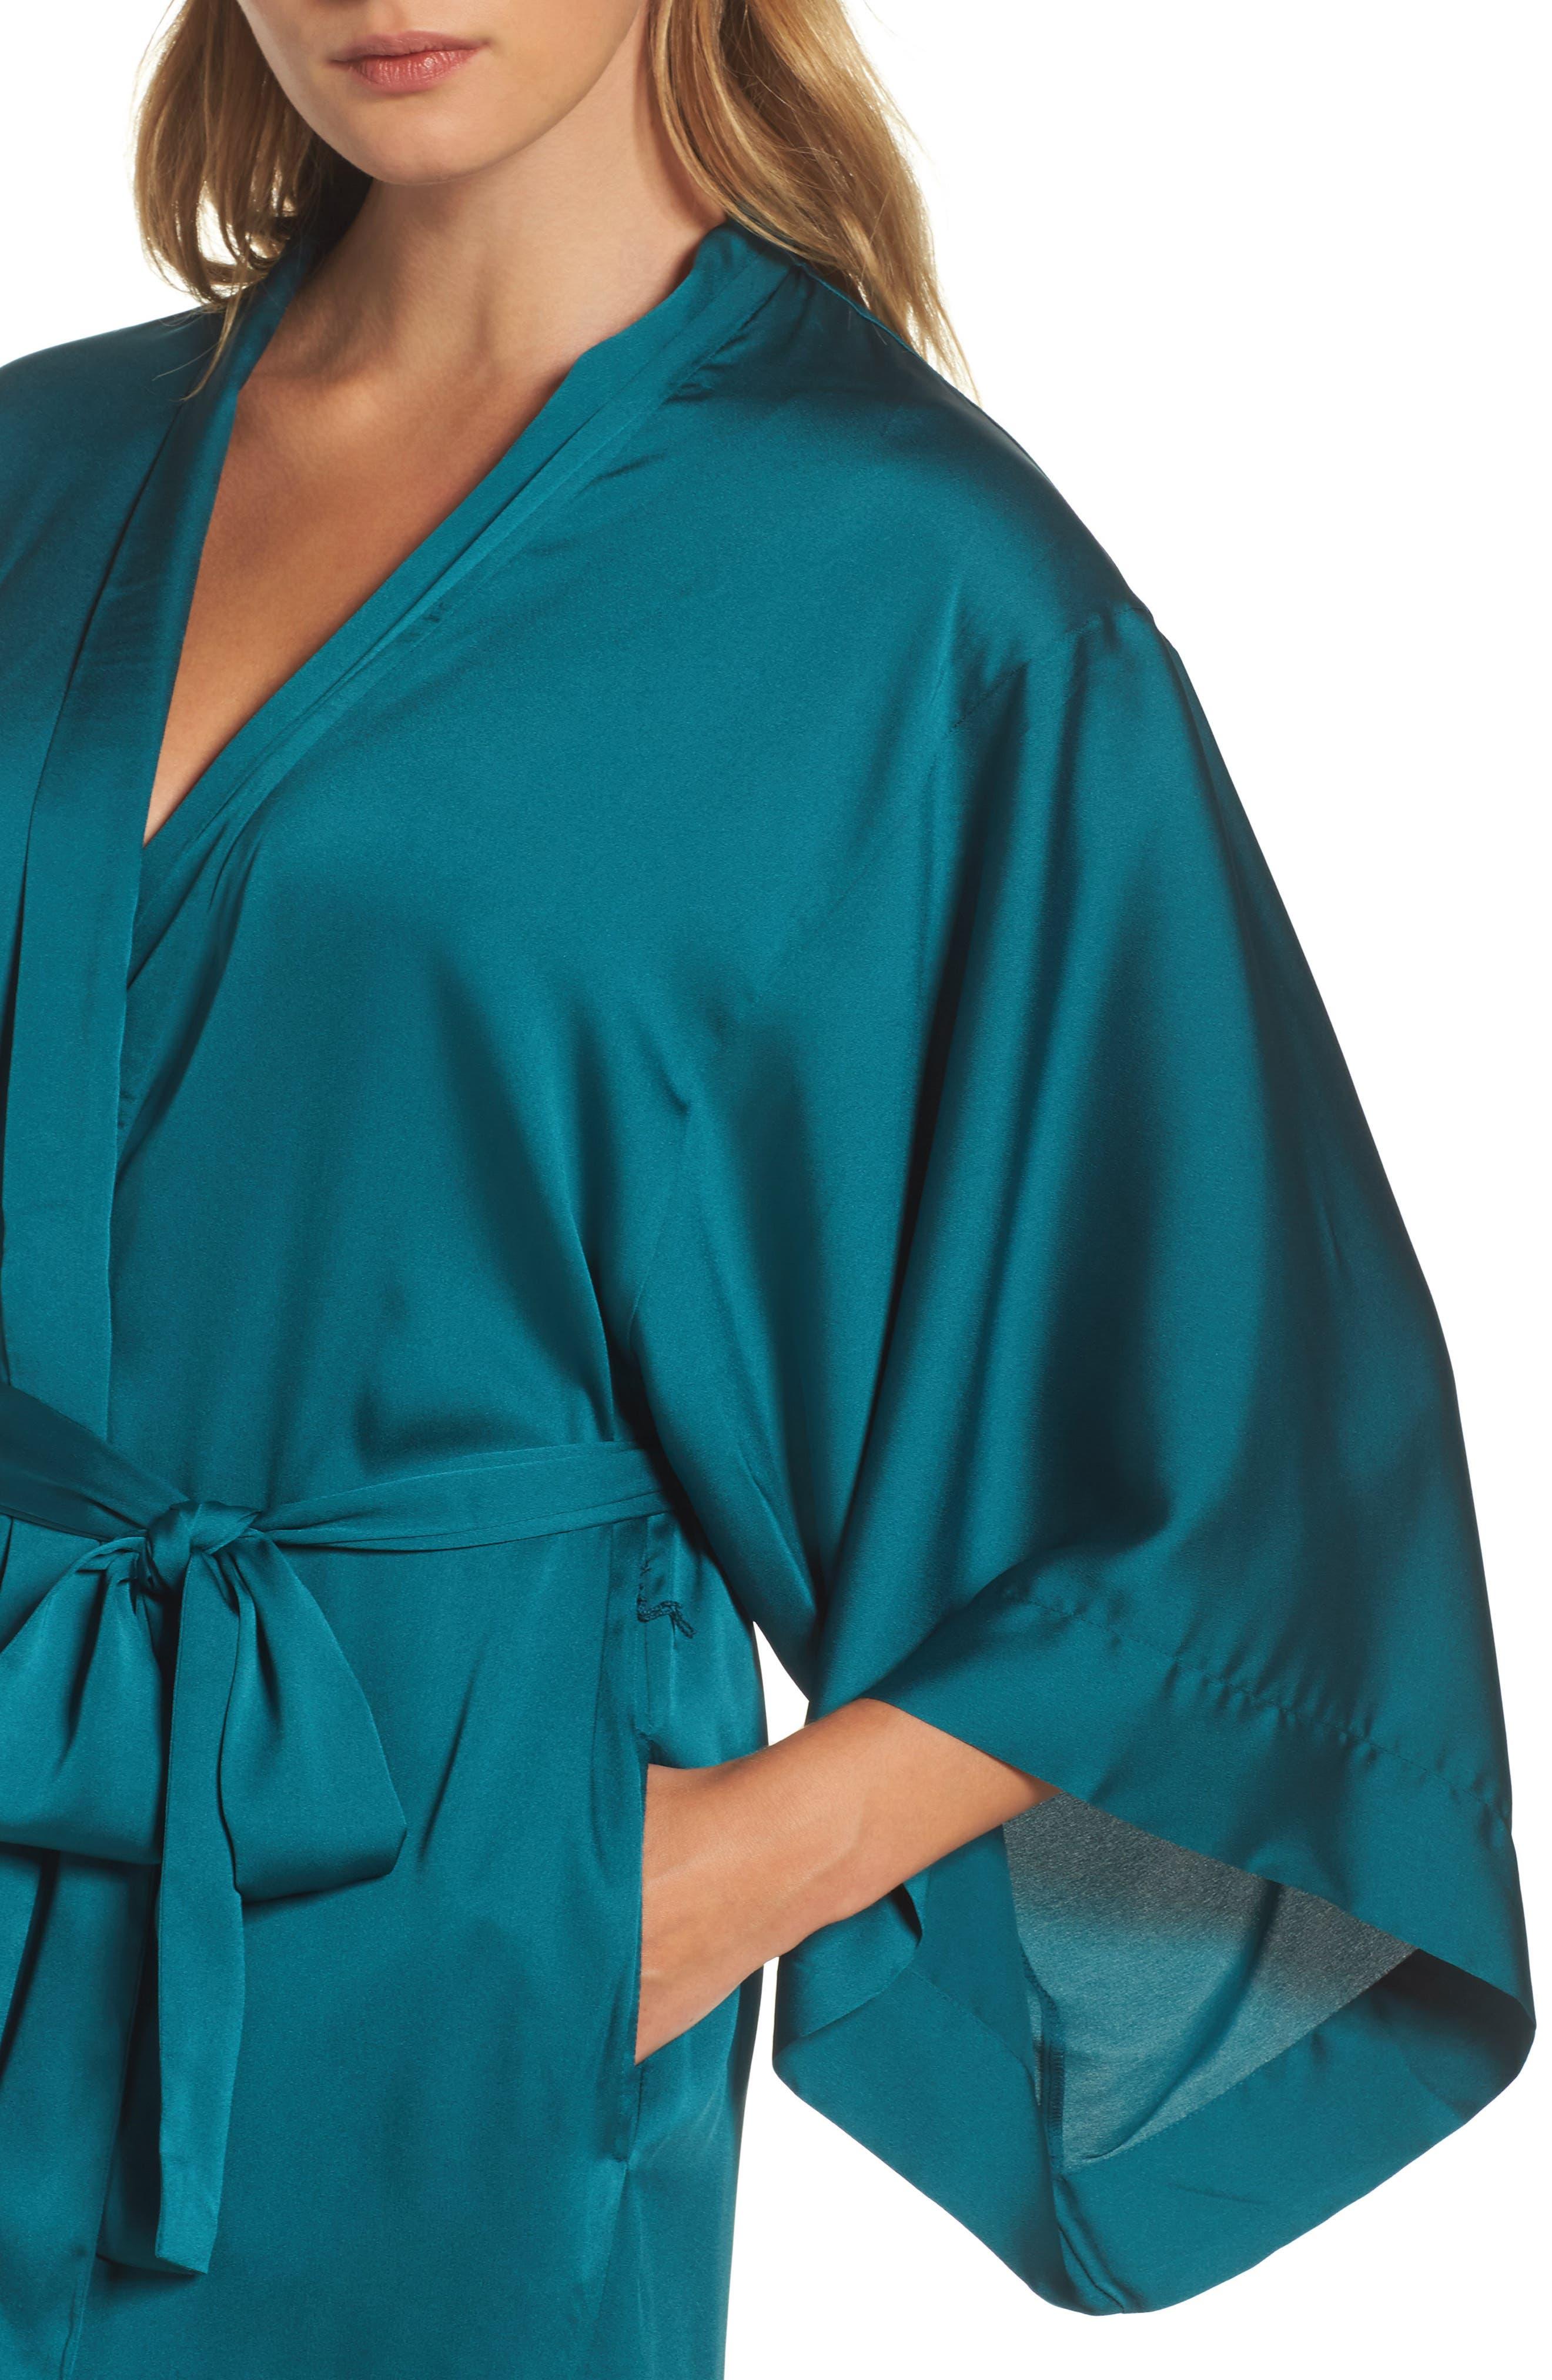 Feathers Satin Wrap,                             Alternate thumbnail 5, color,                             Blue Green